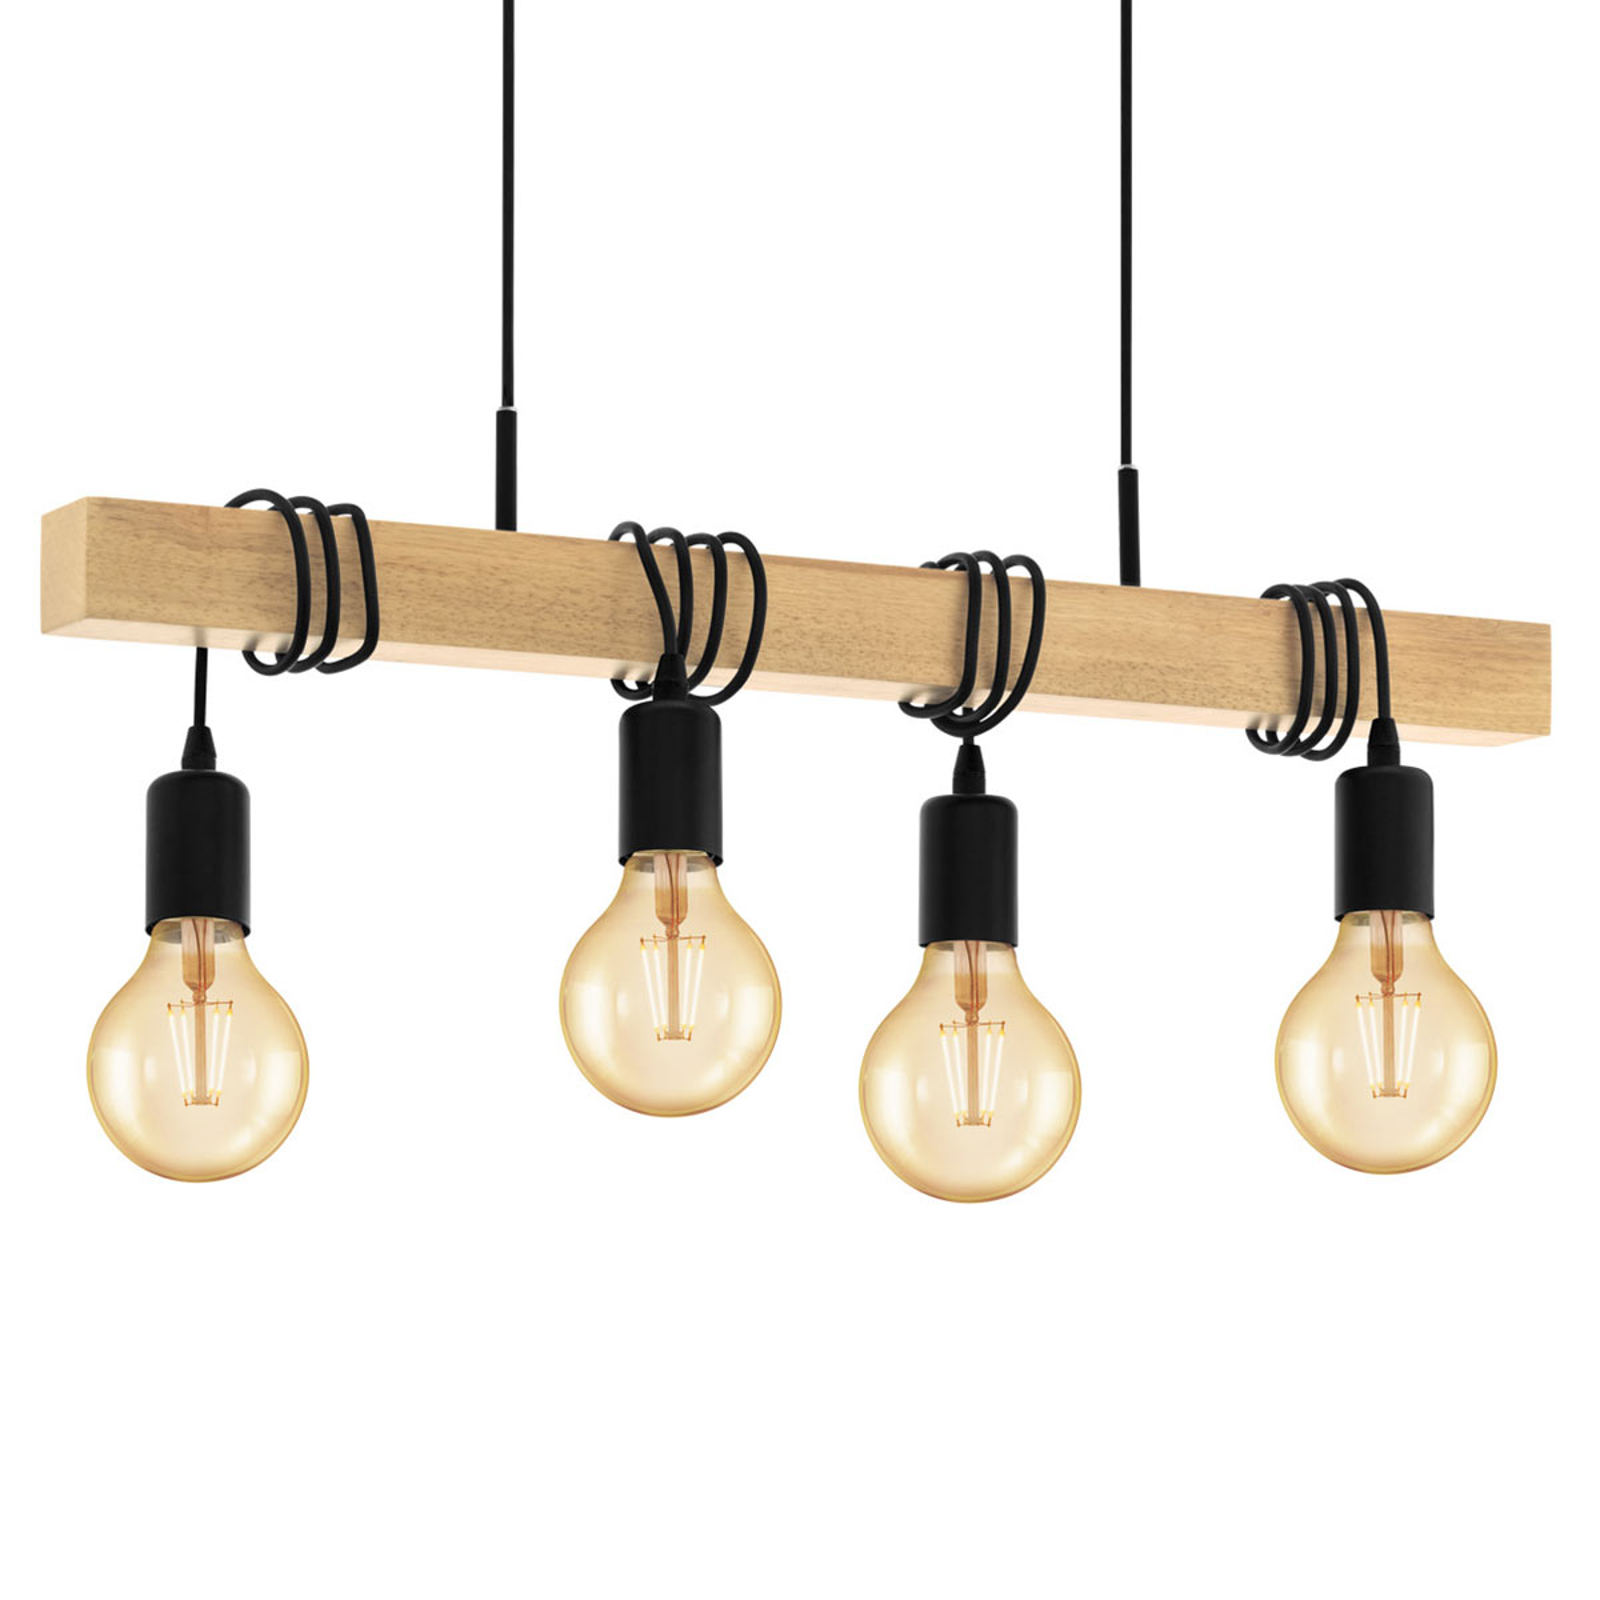 Hanglamp Townshend met 4 lampen